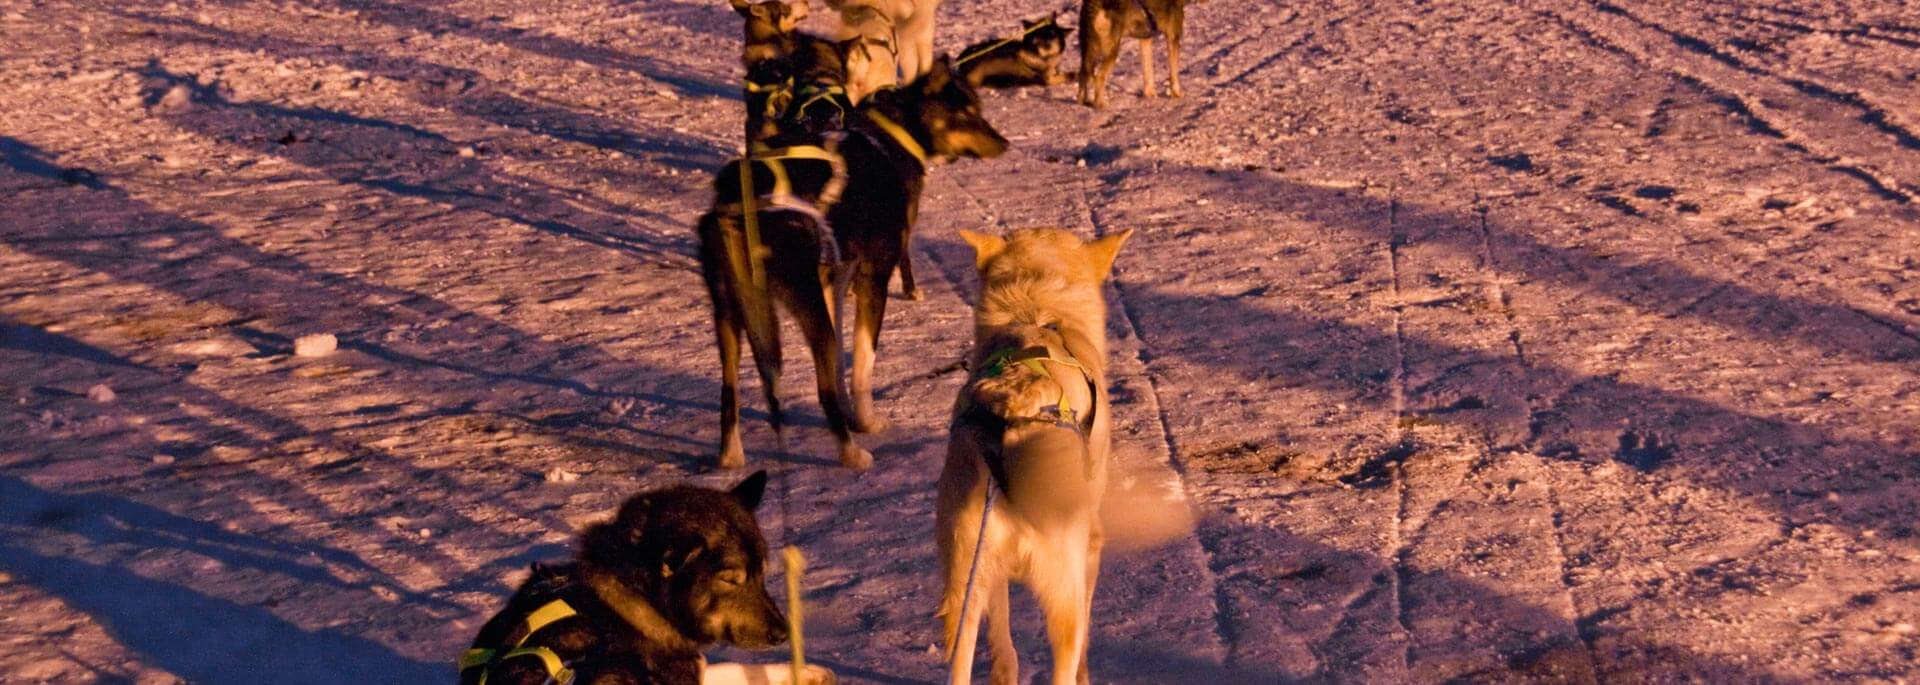 Reisetipp: Hundeschlittenfahrt in Nordnorwegen